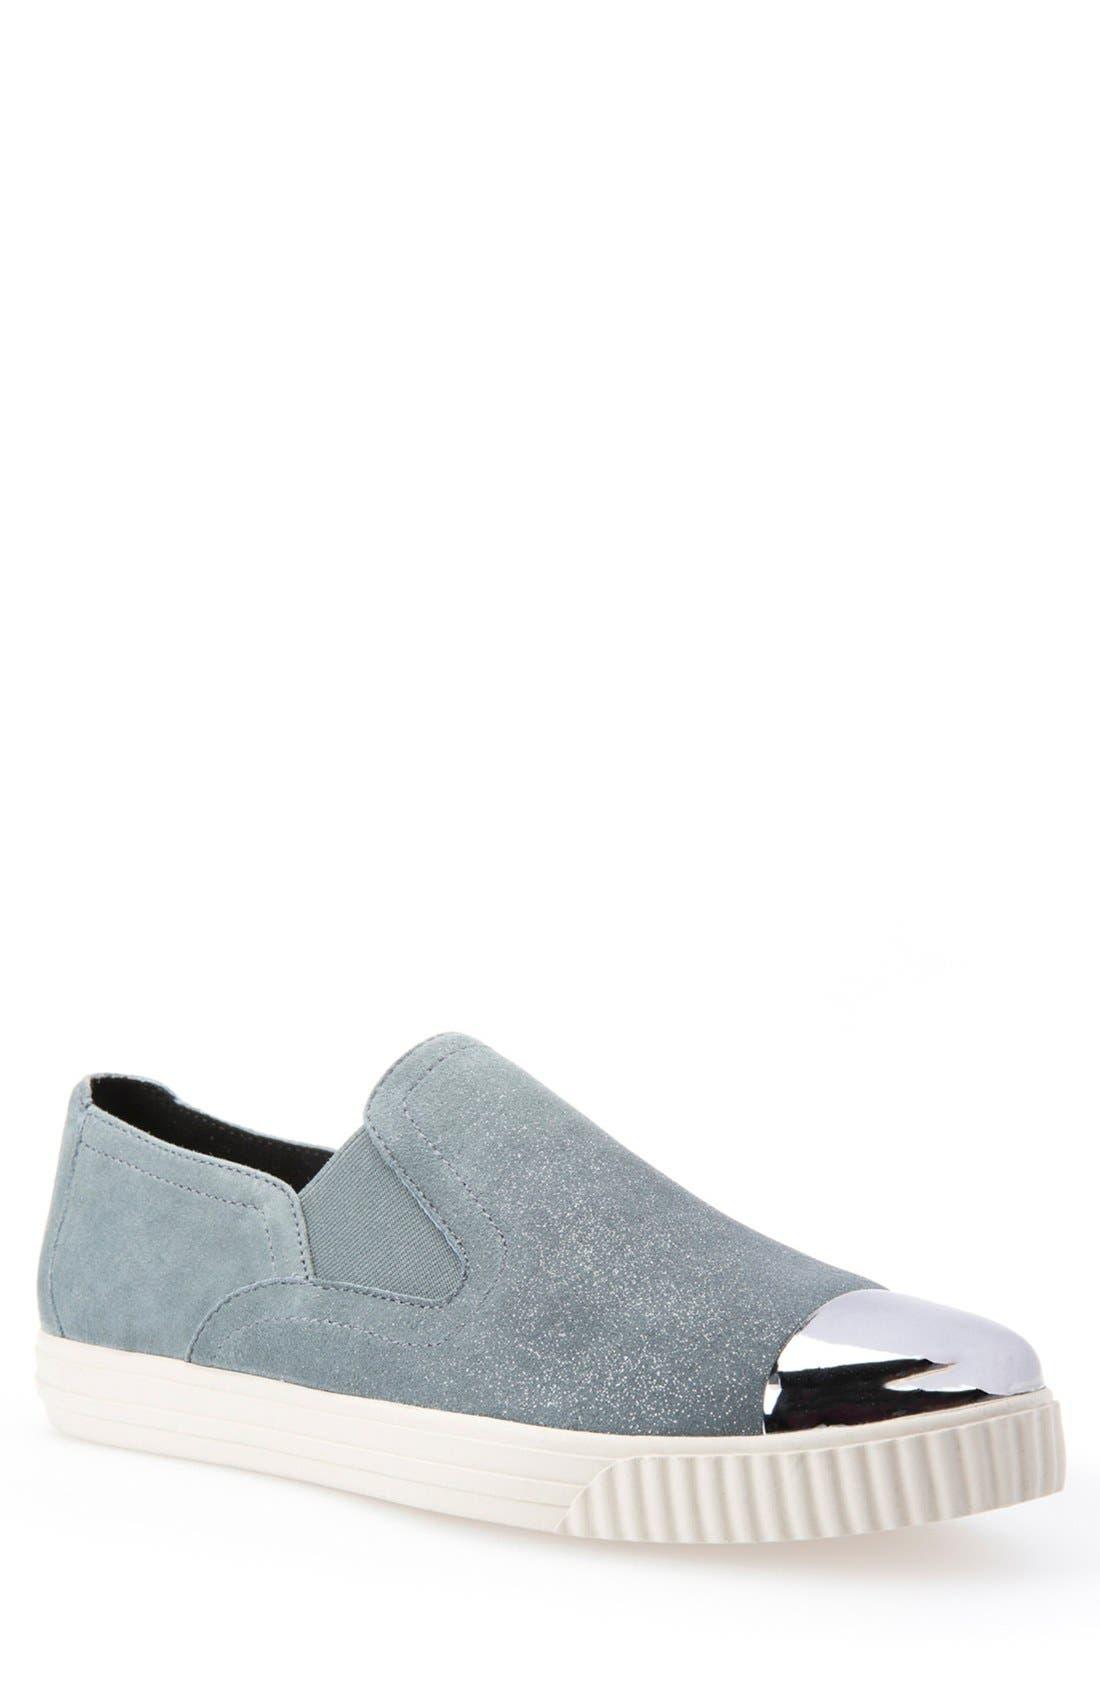 Main Image - Geox 'Amalthia' Cap Toe Sneaker (Women)